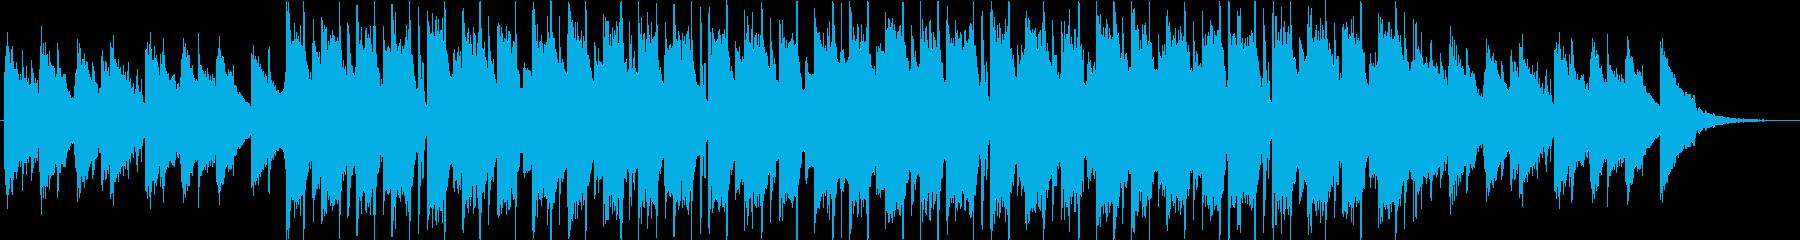 Lo-Fi Hiphop/フレンチ風の再生済みの波形